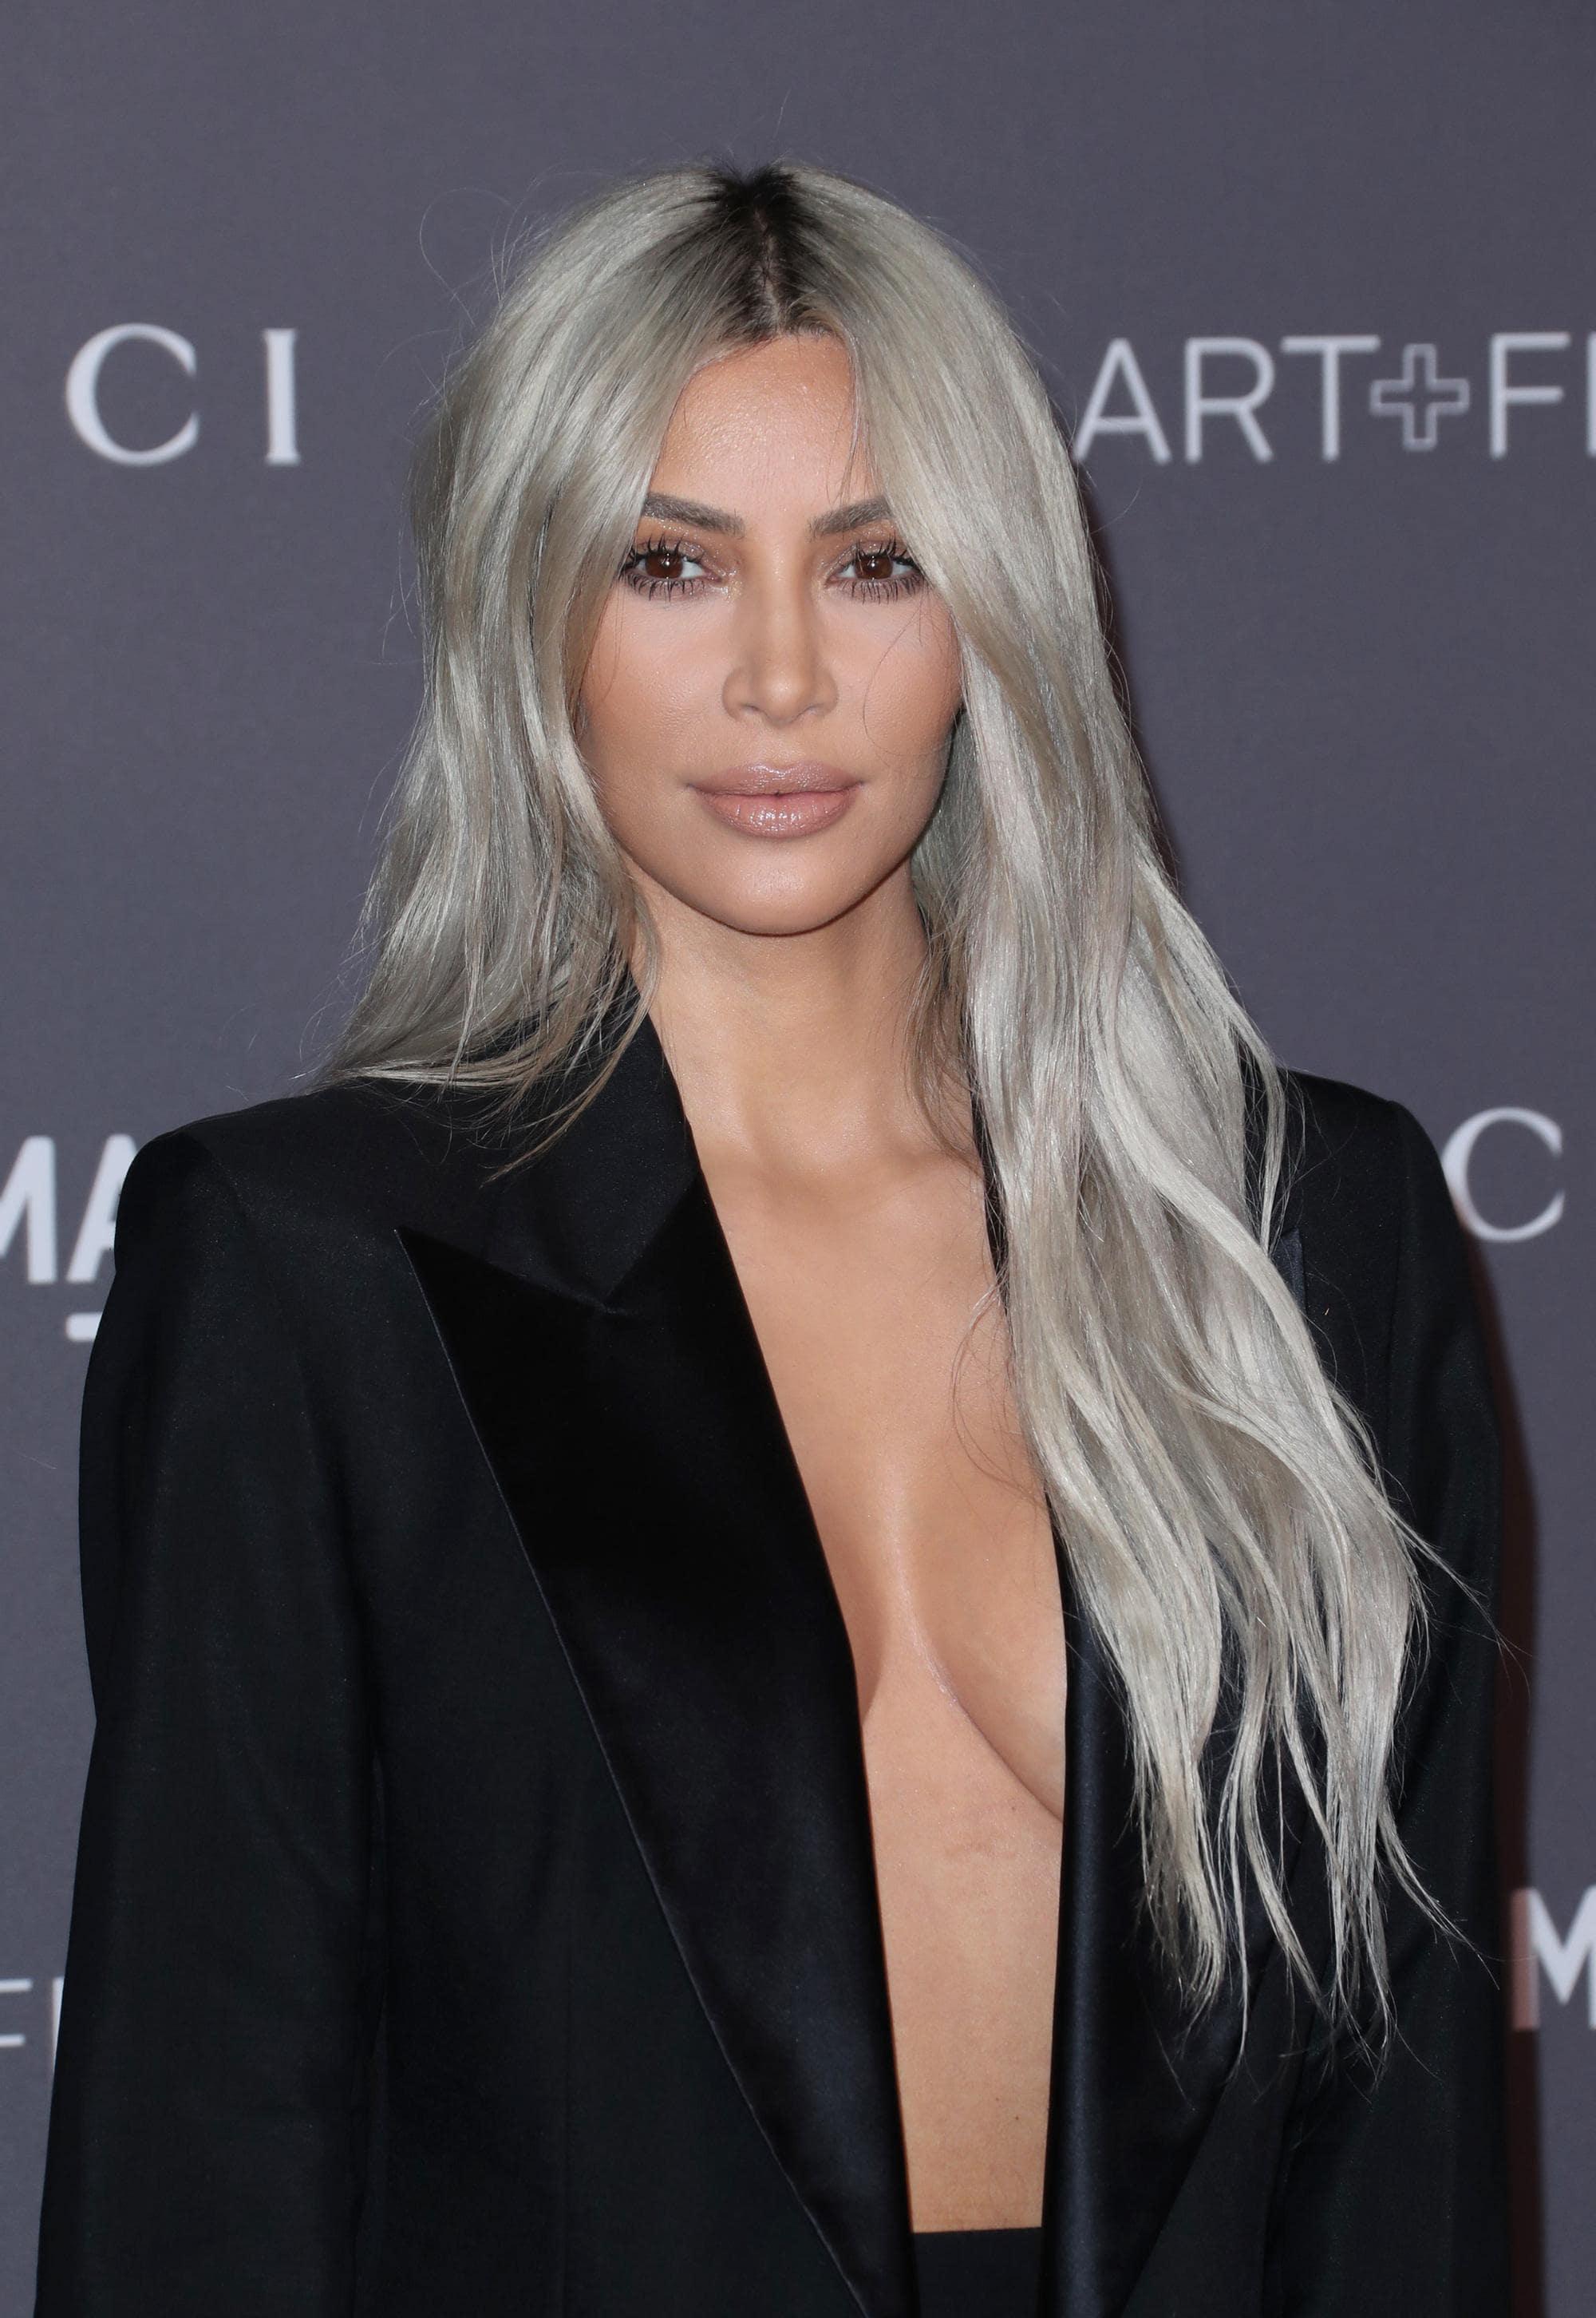 Kim Kardashian West with long wavy silver blonde hair, wearing black blazer